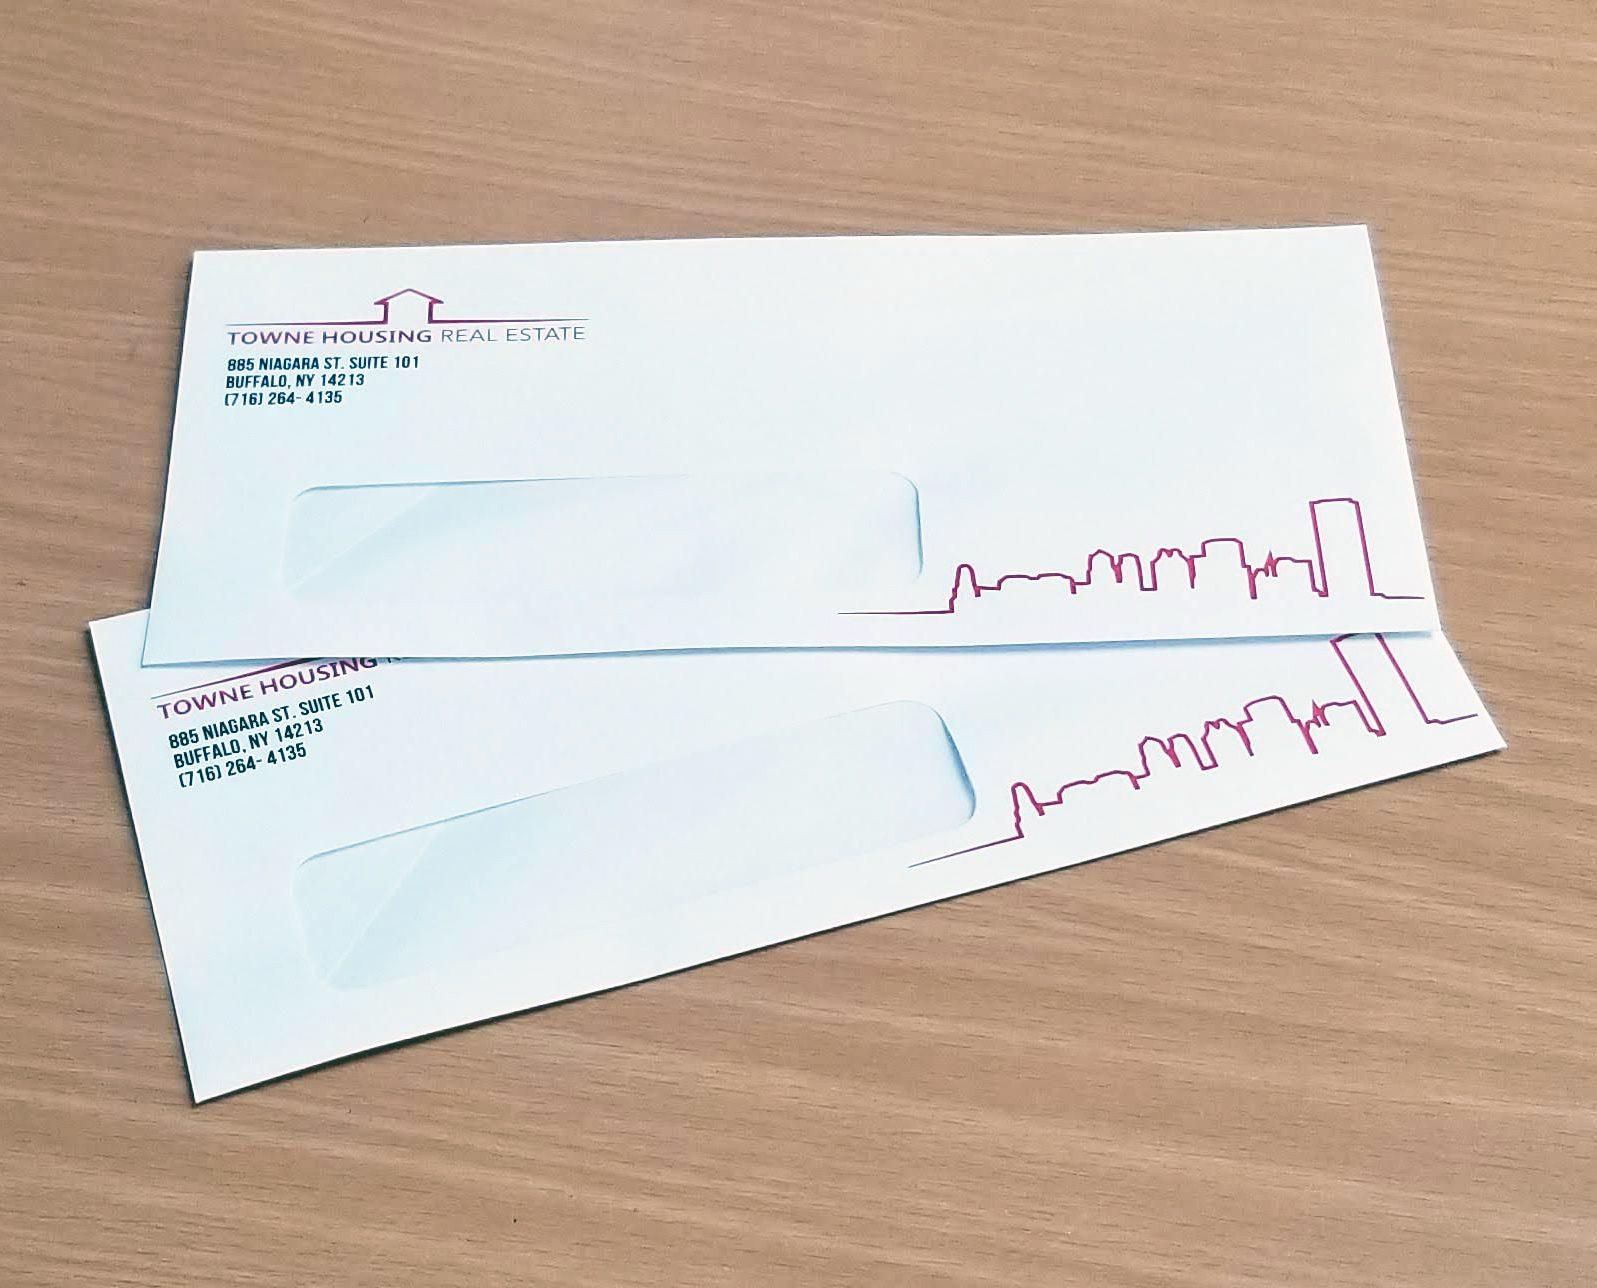 Towne Housing Envelopes